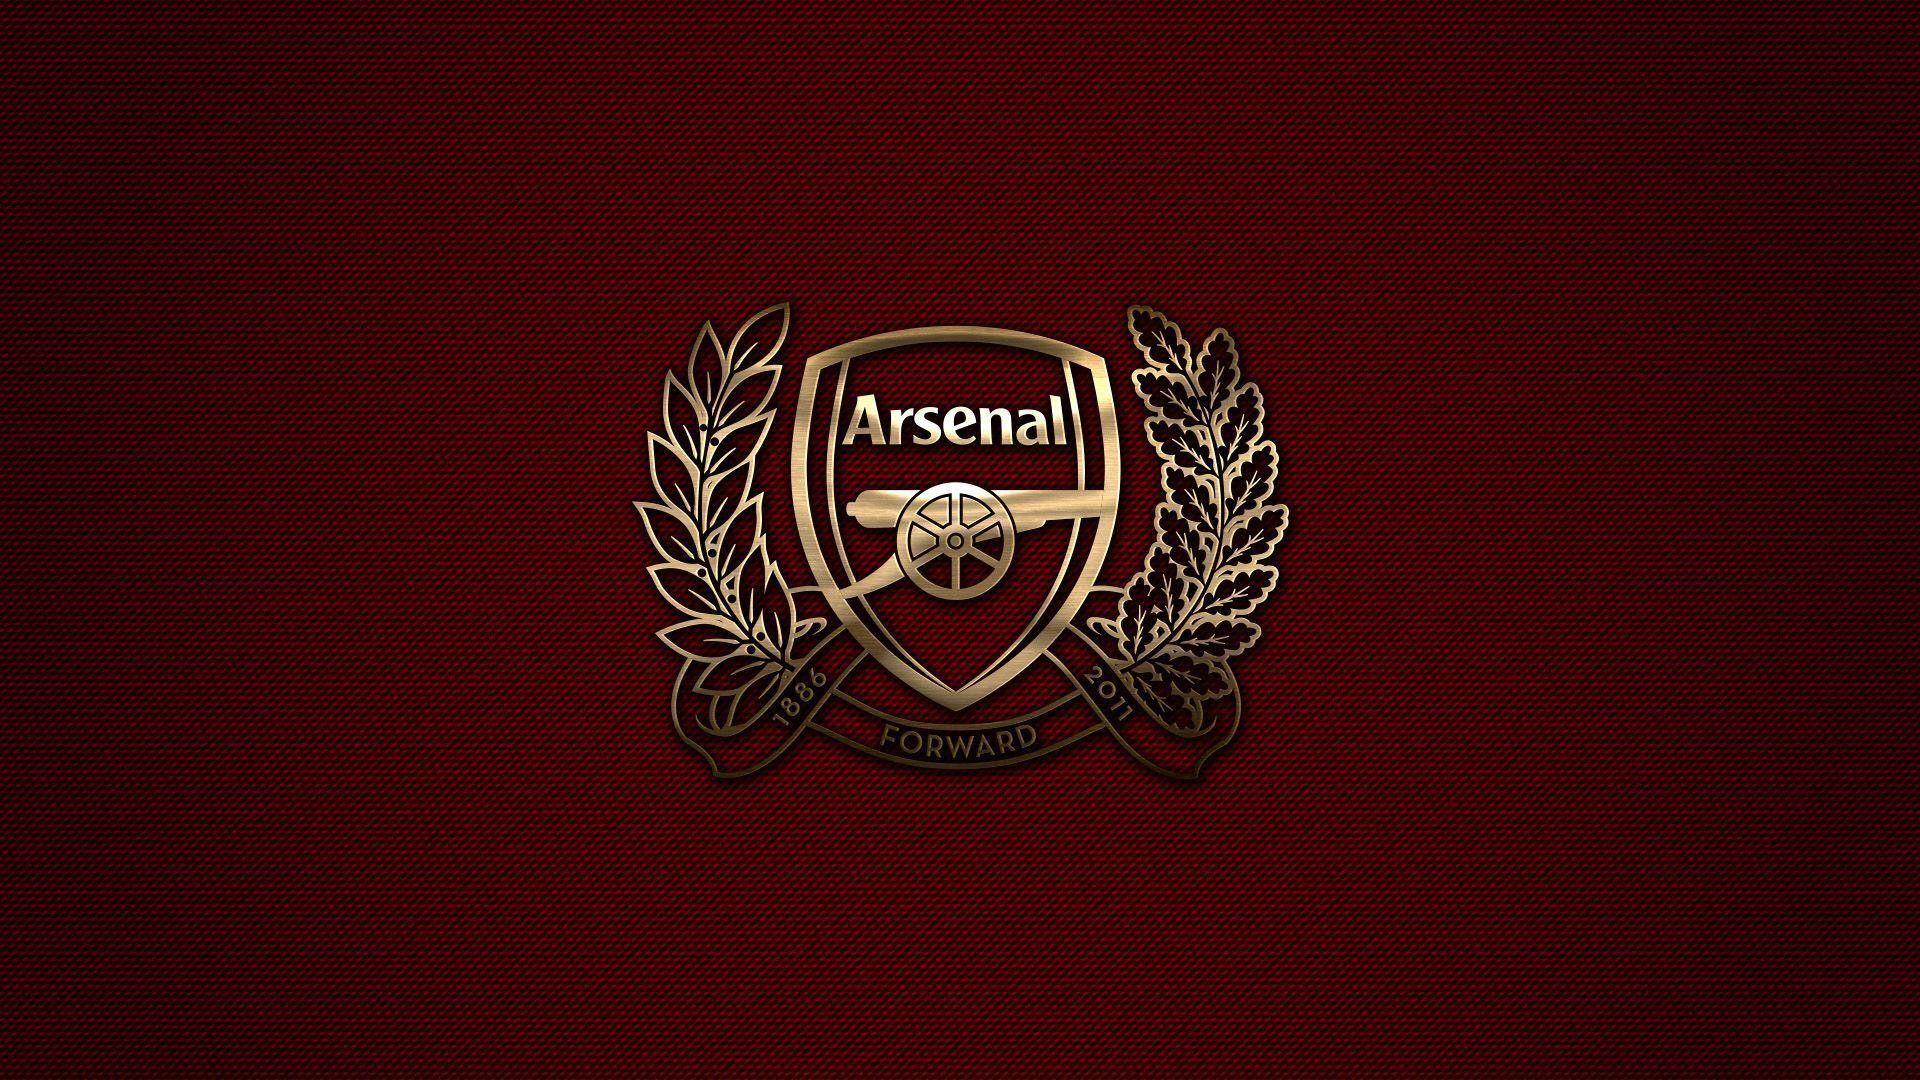 Arsenal Fc Wallpaper Hd Wallpaper Arsenal Wallpapers